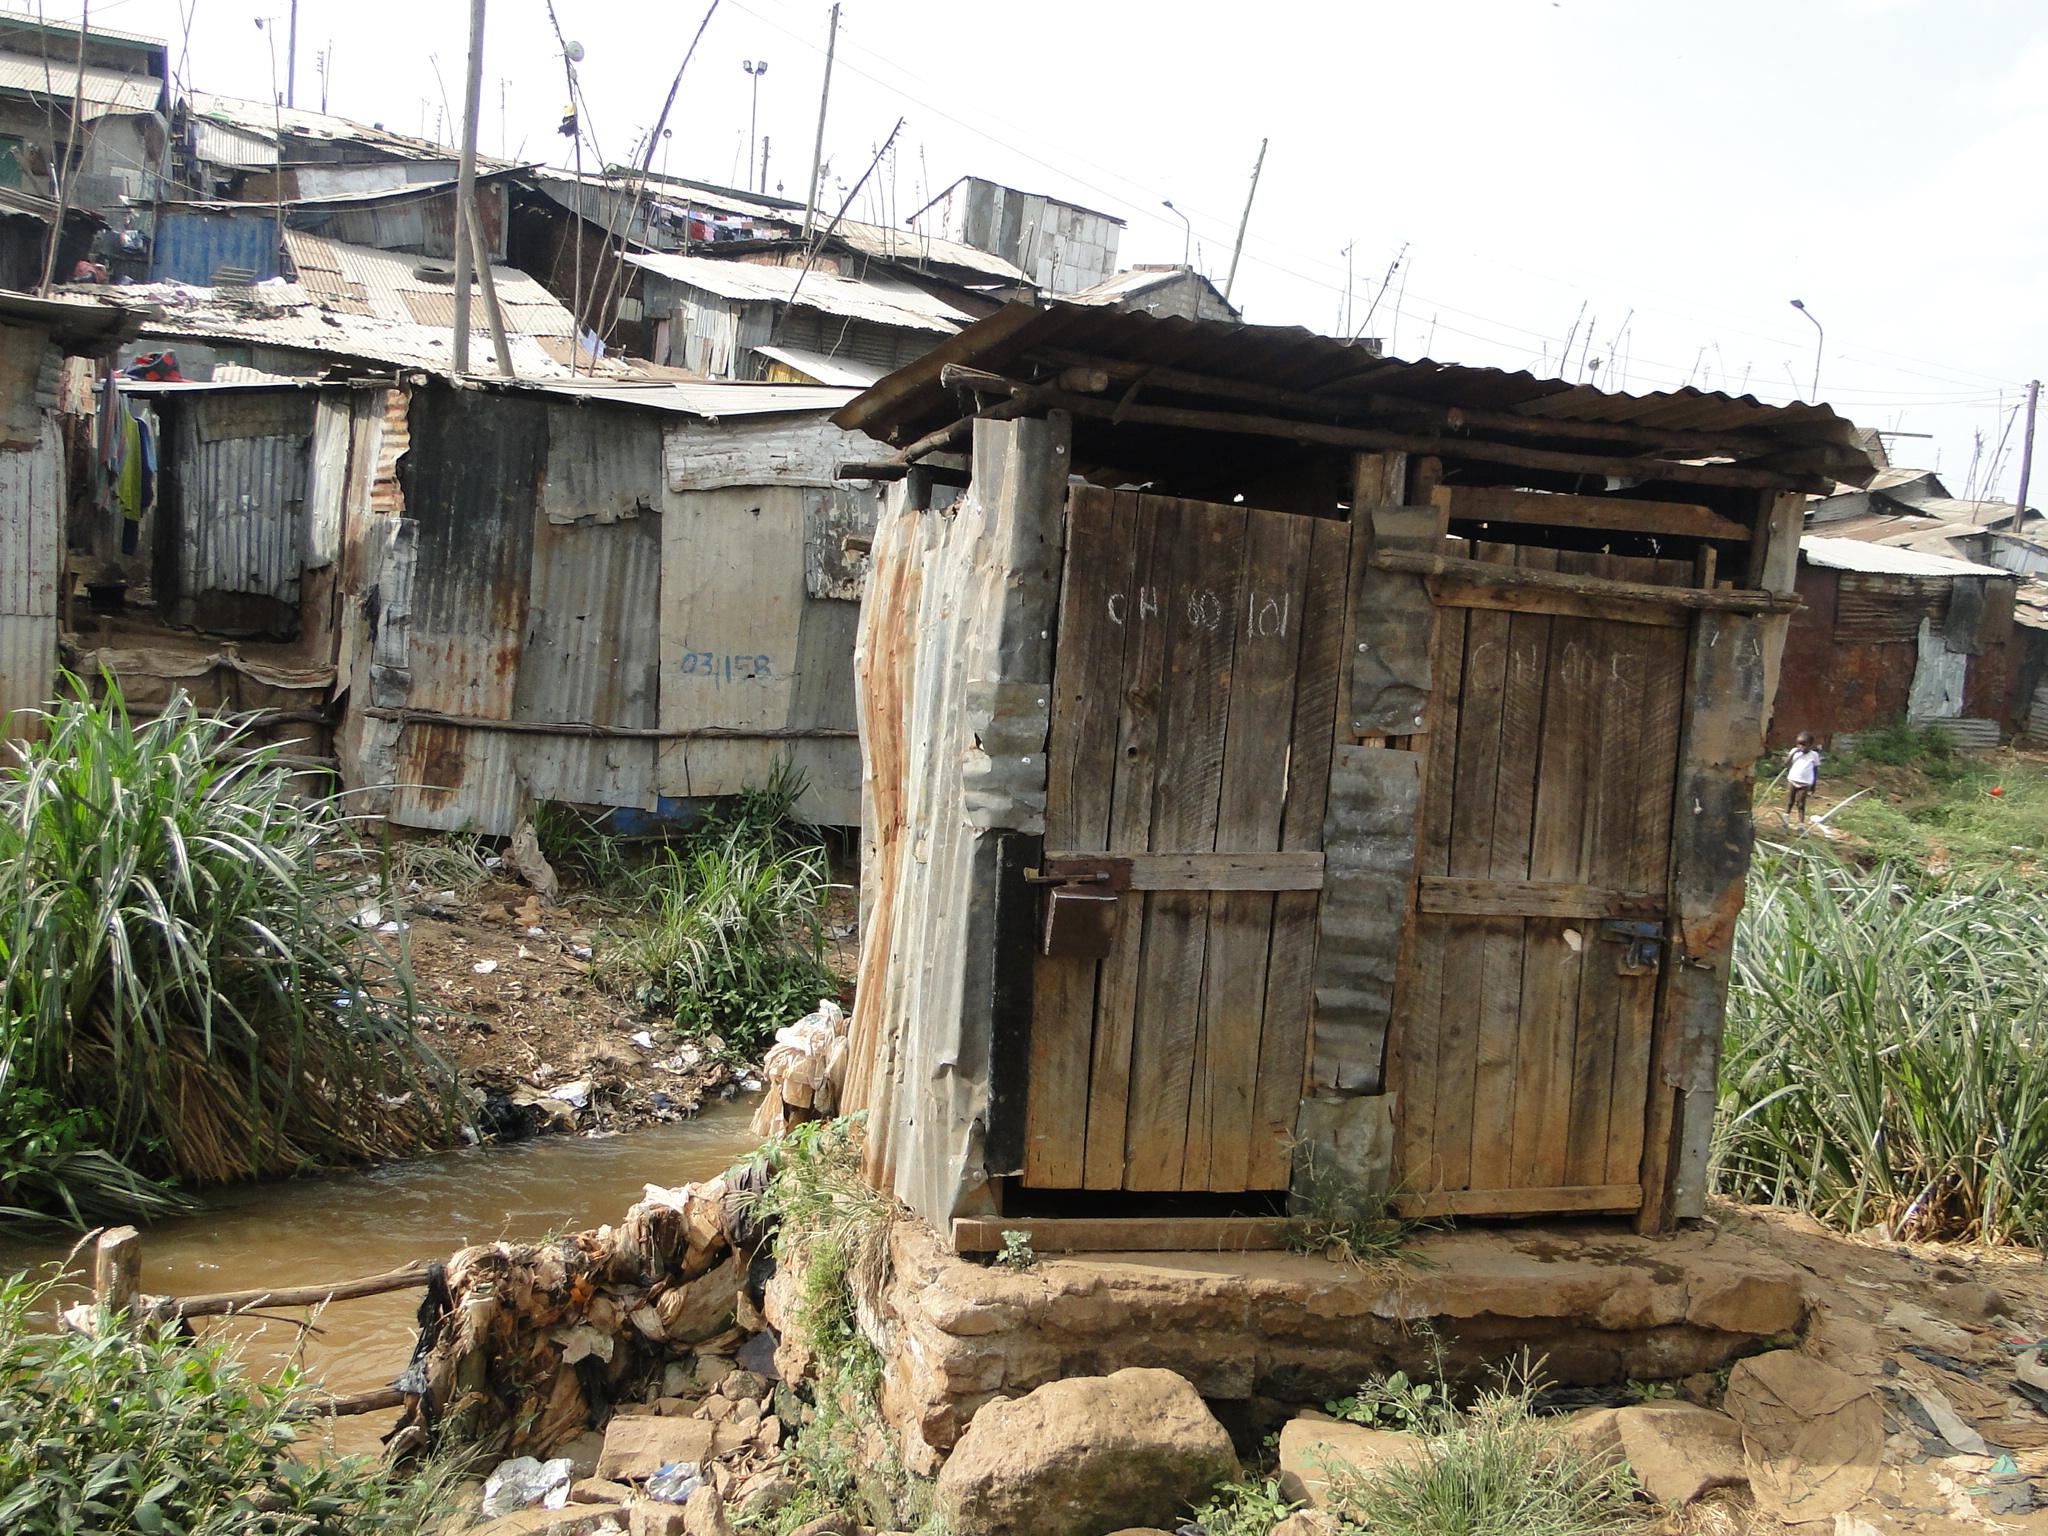 A shared latrine facility